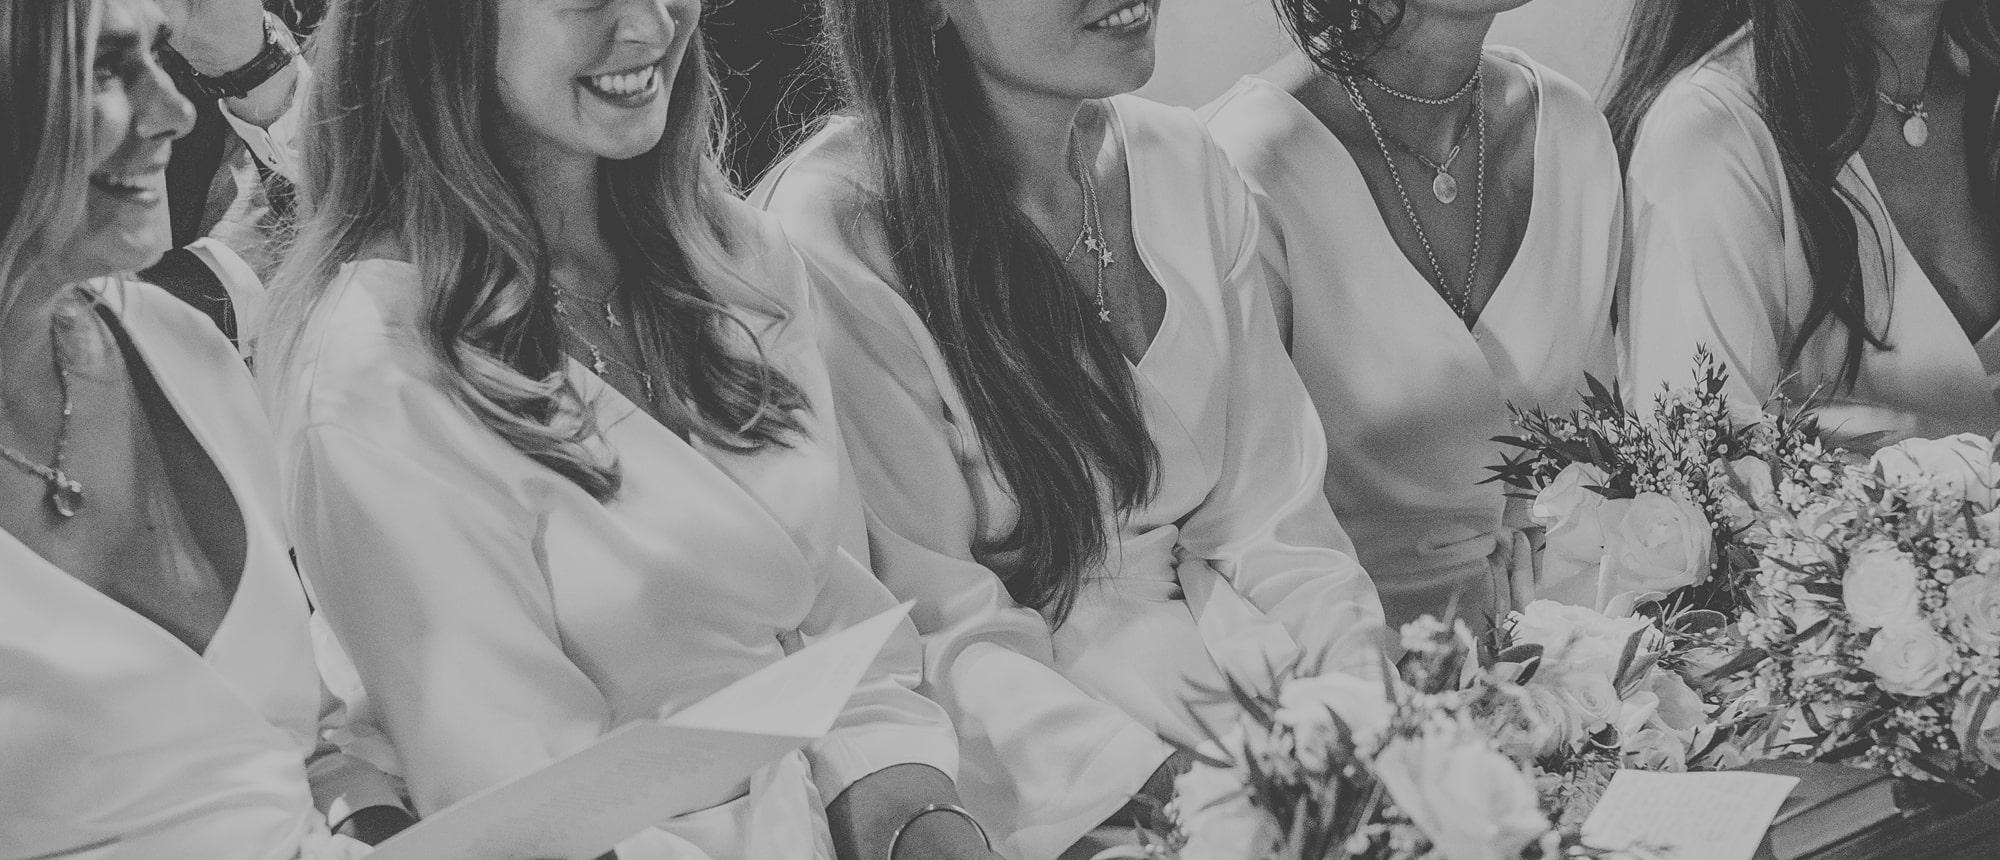 Daniella Draper Jewellery, Wedding Bands